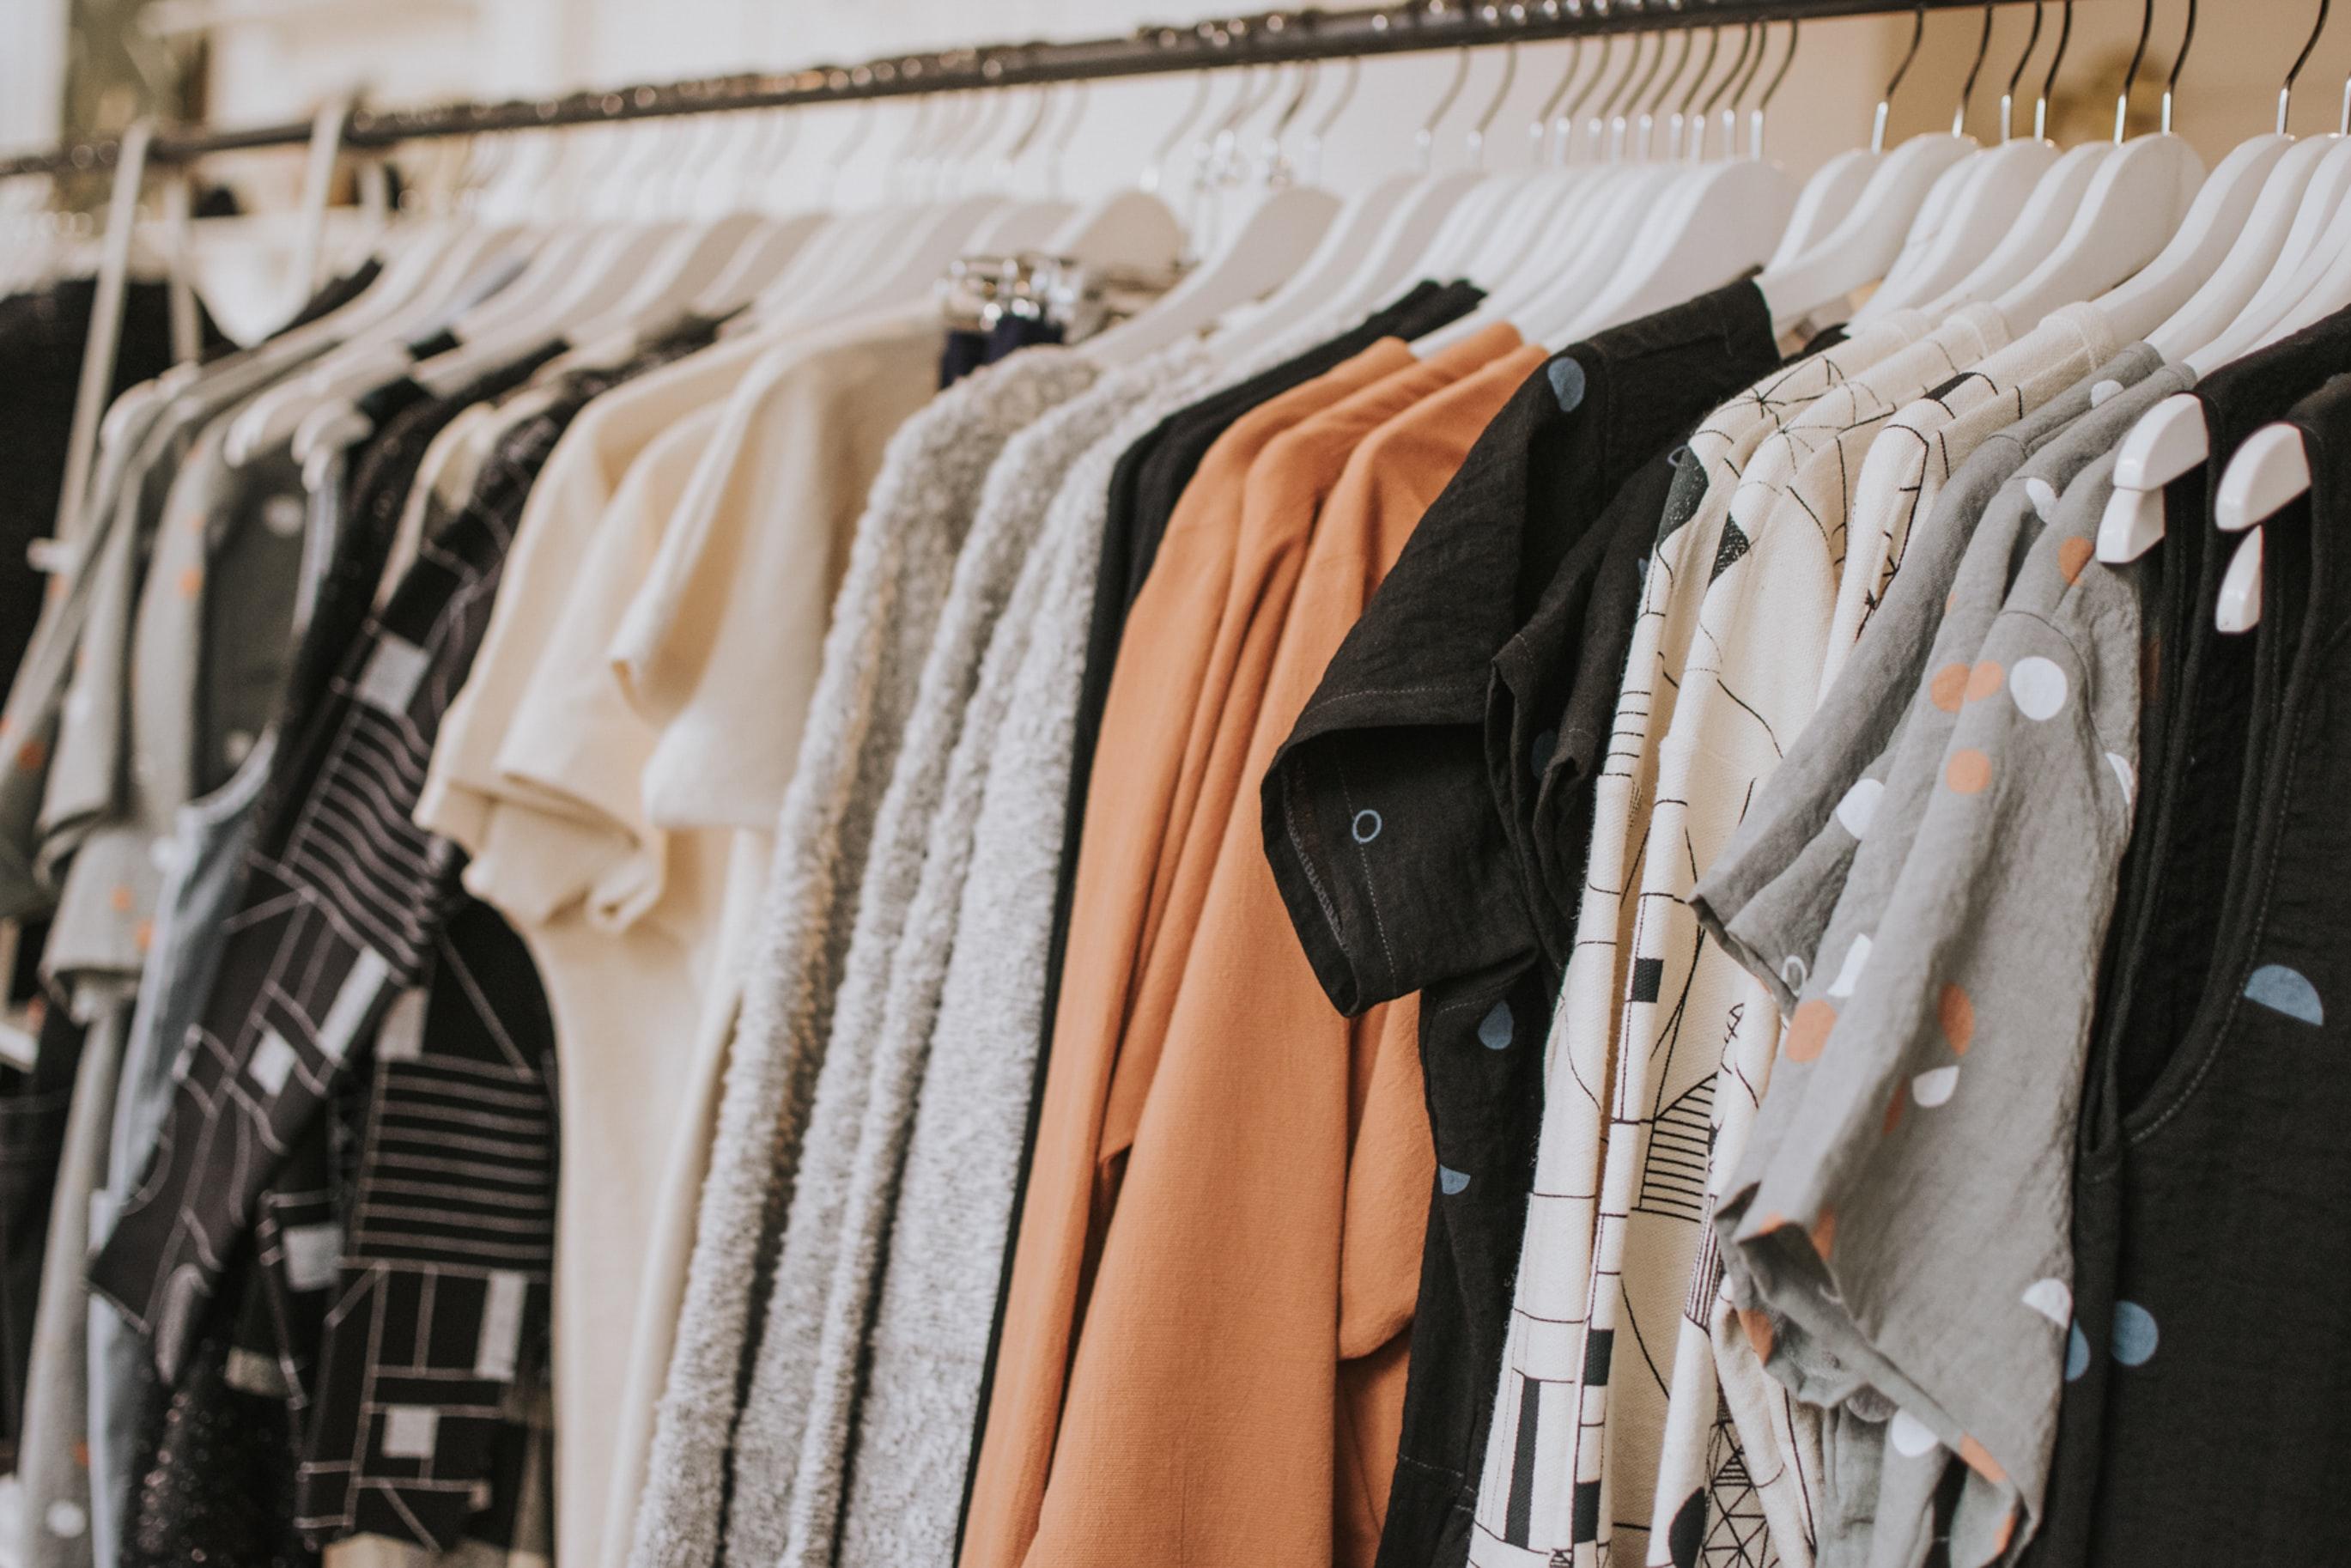 Clothing rack full of tops; image by Lauren Fleischmann, via Unsplash.com.